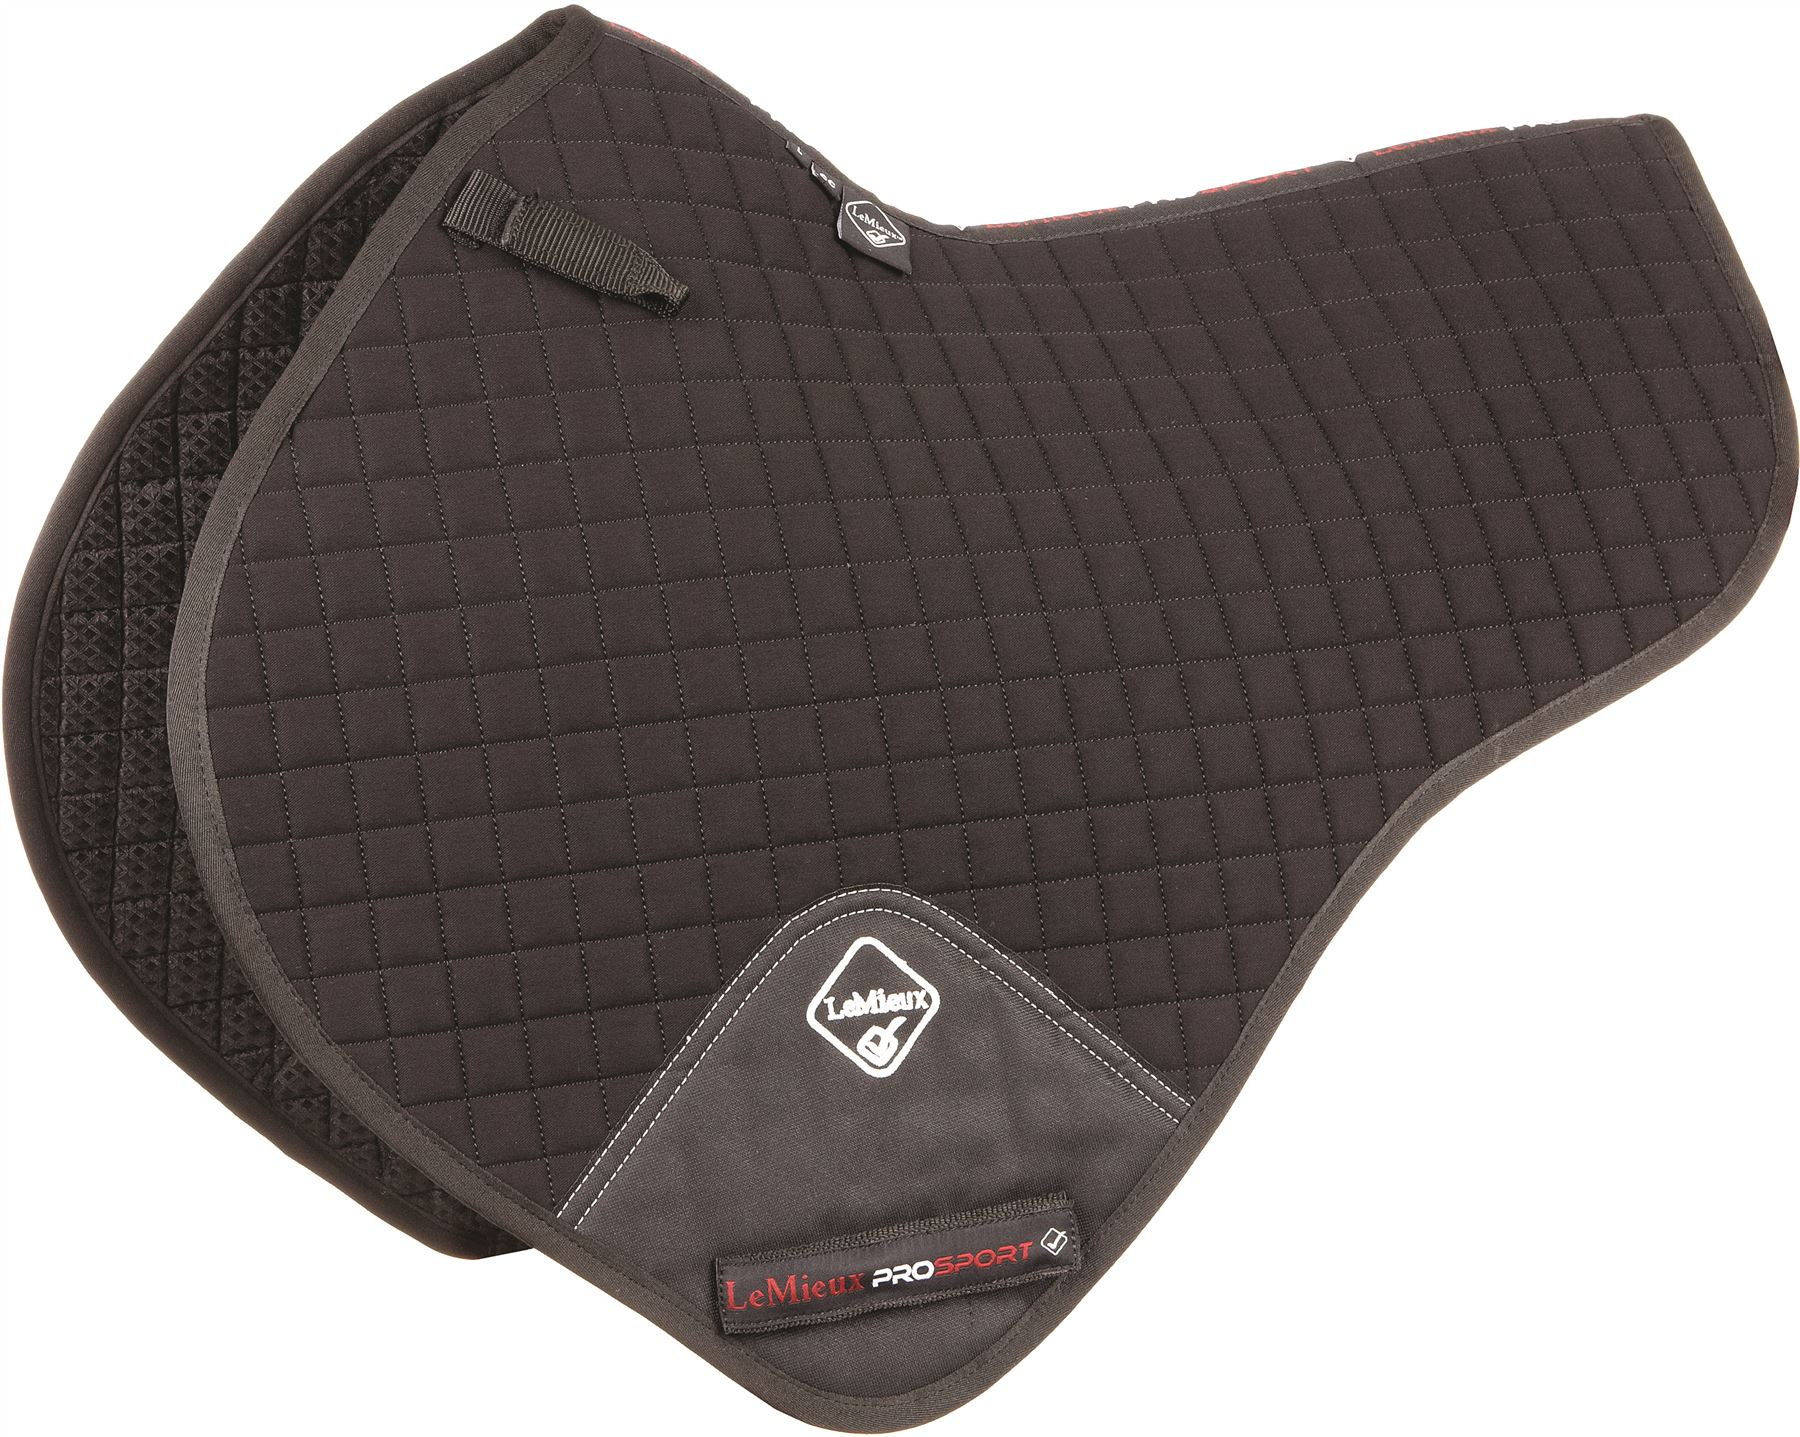 LeMieux ProSport Close Contact Half Pad Square (D-Ring) Saddle Pad Half Größe L 1499P aa5c0e